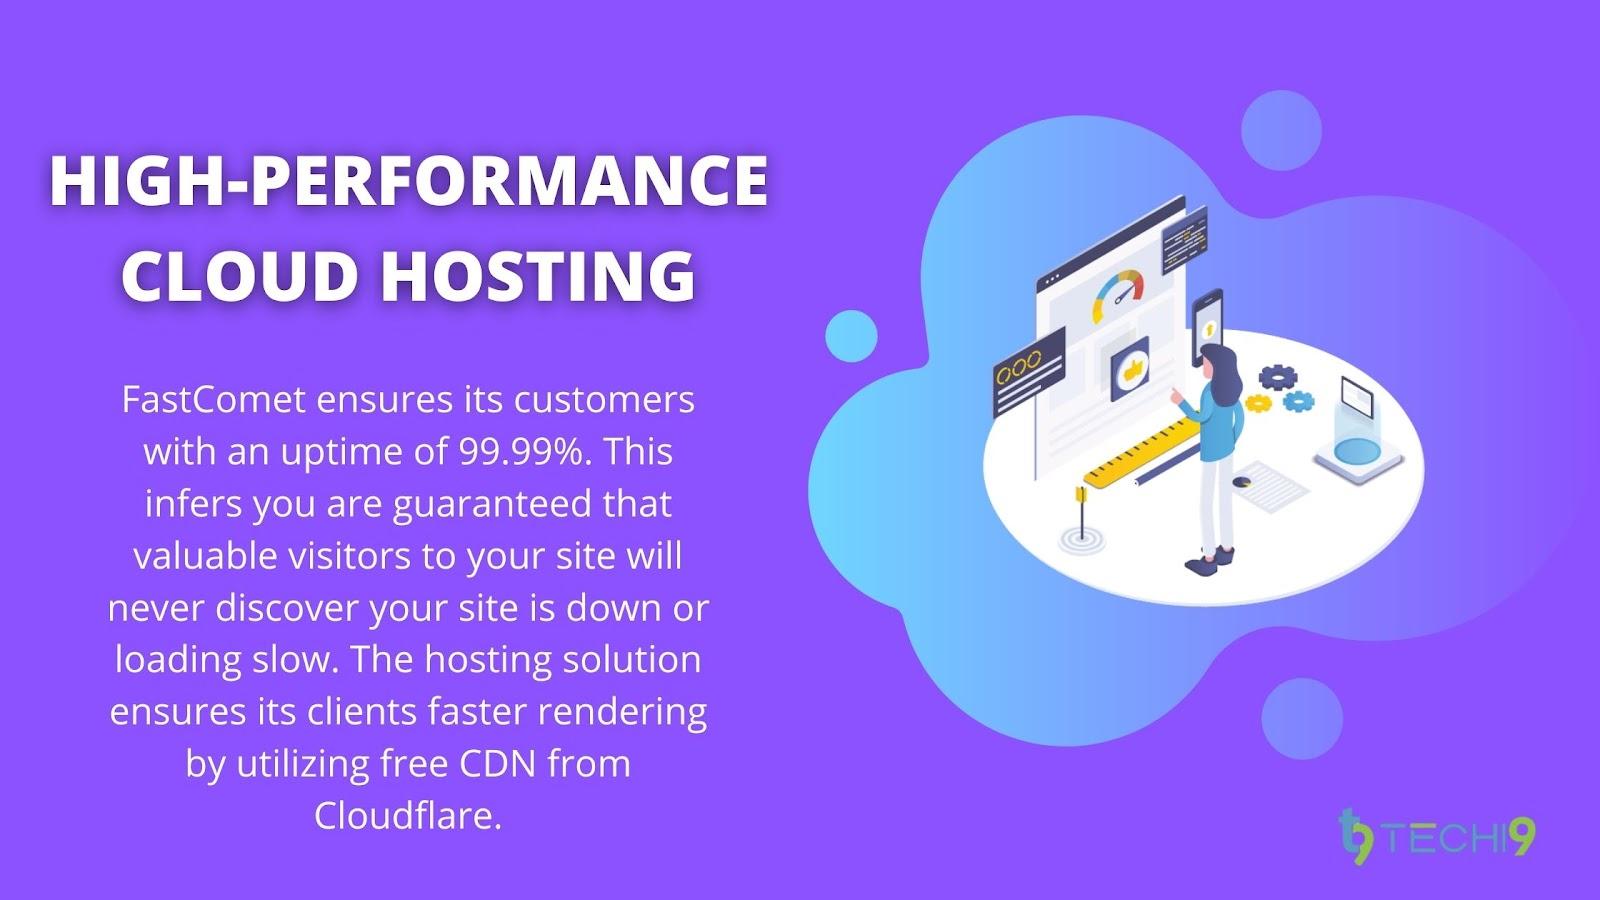 FastComet Managed Cloud Hosting - Performance & Speed